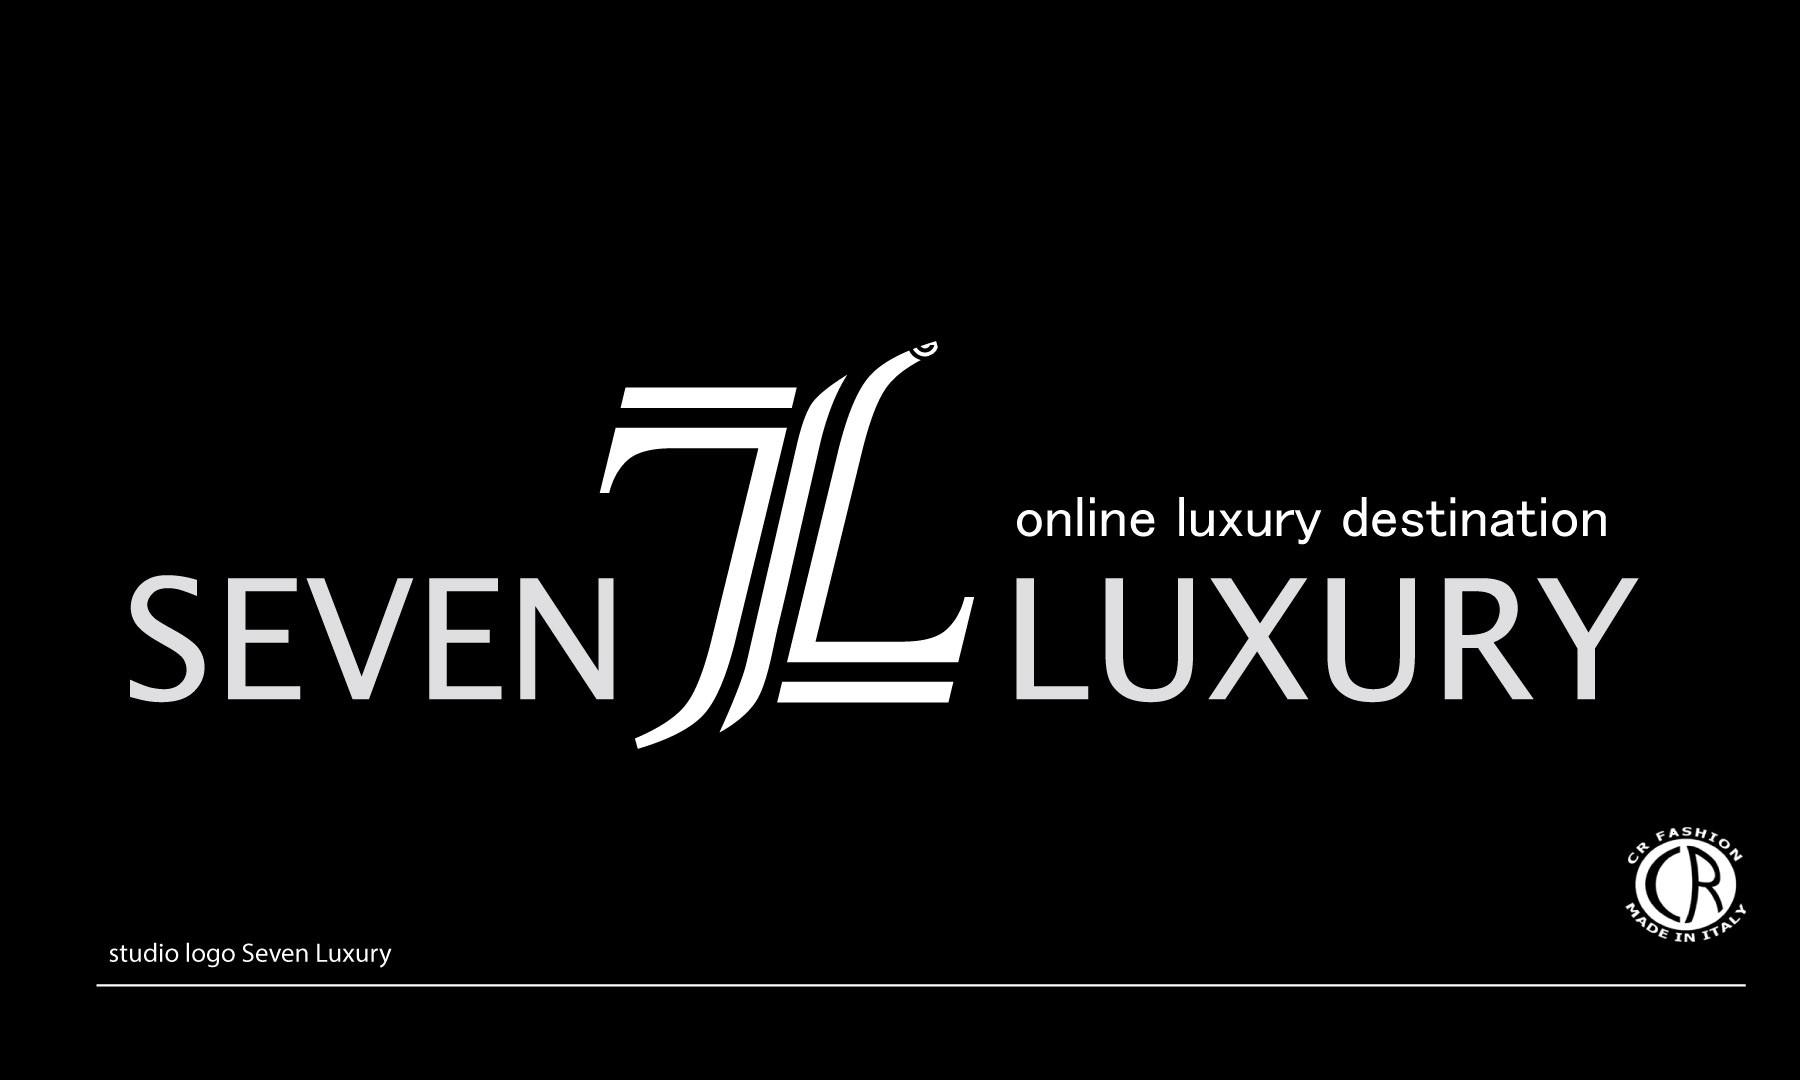 cr fashion seven luxury logo